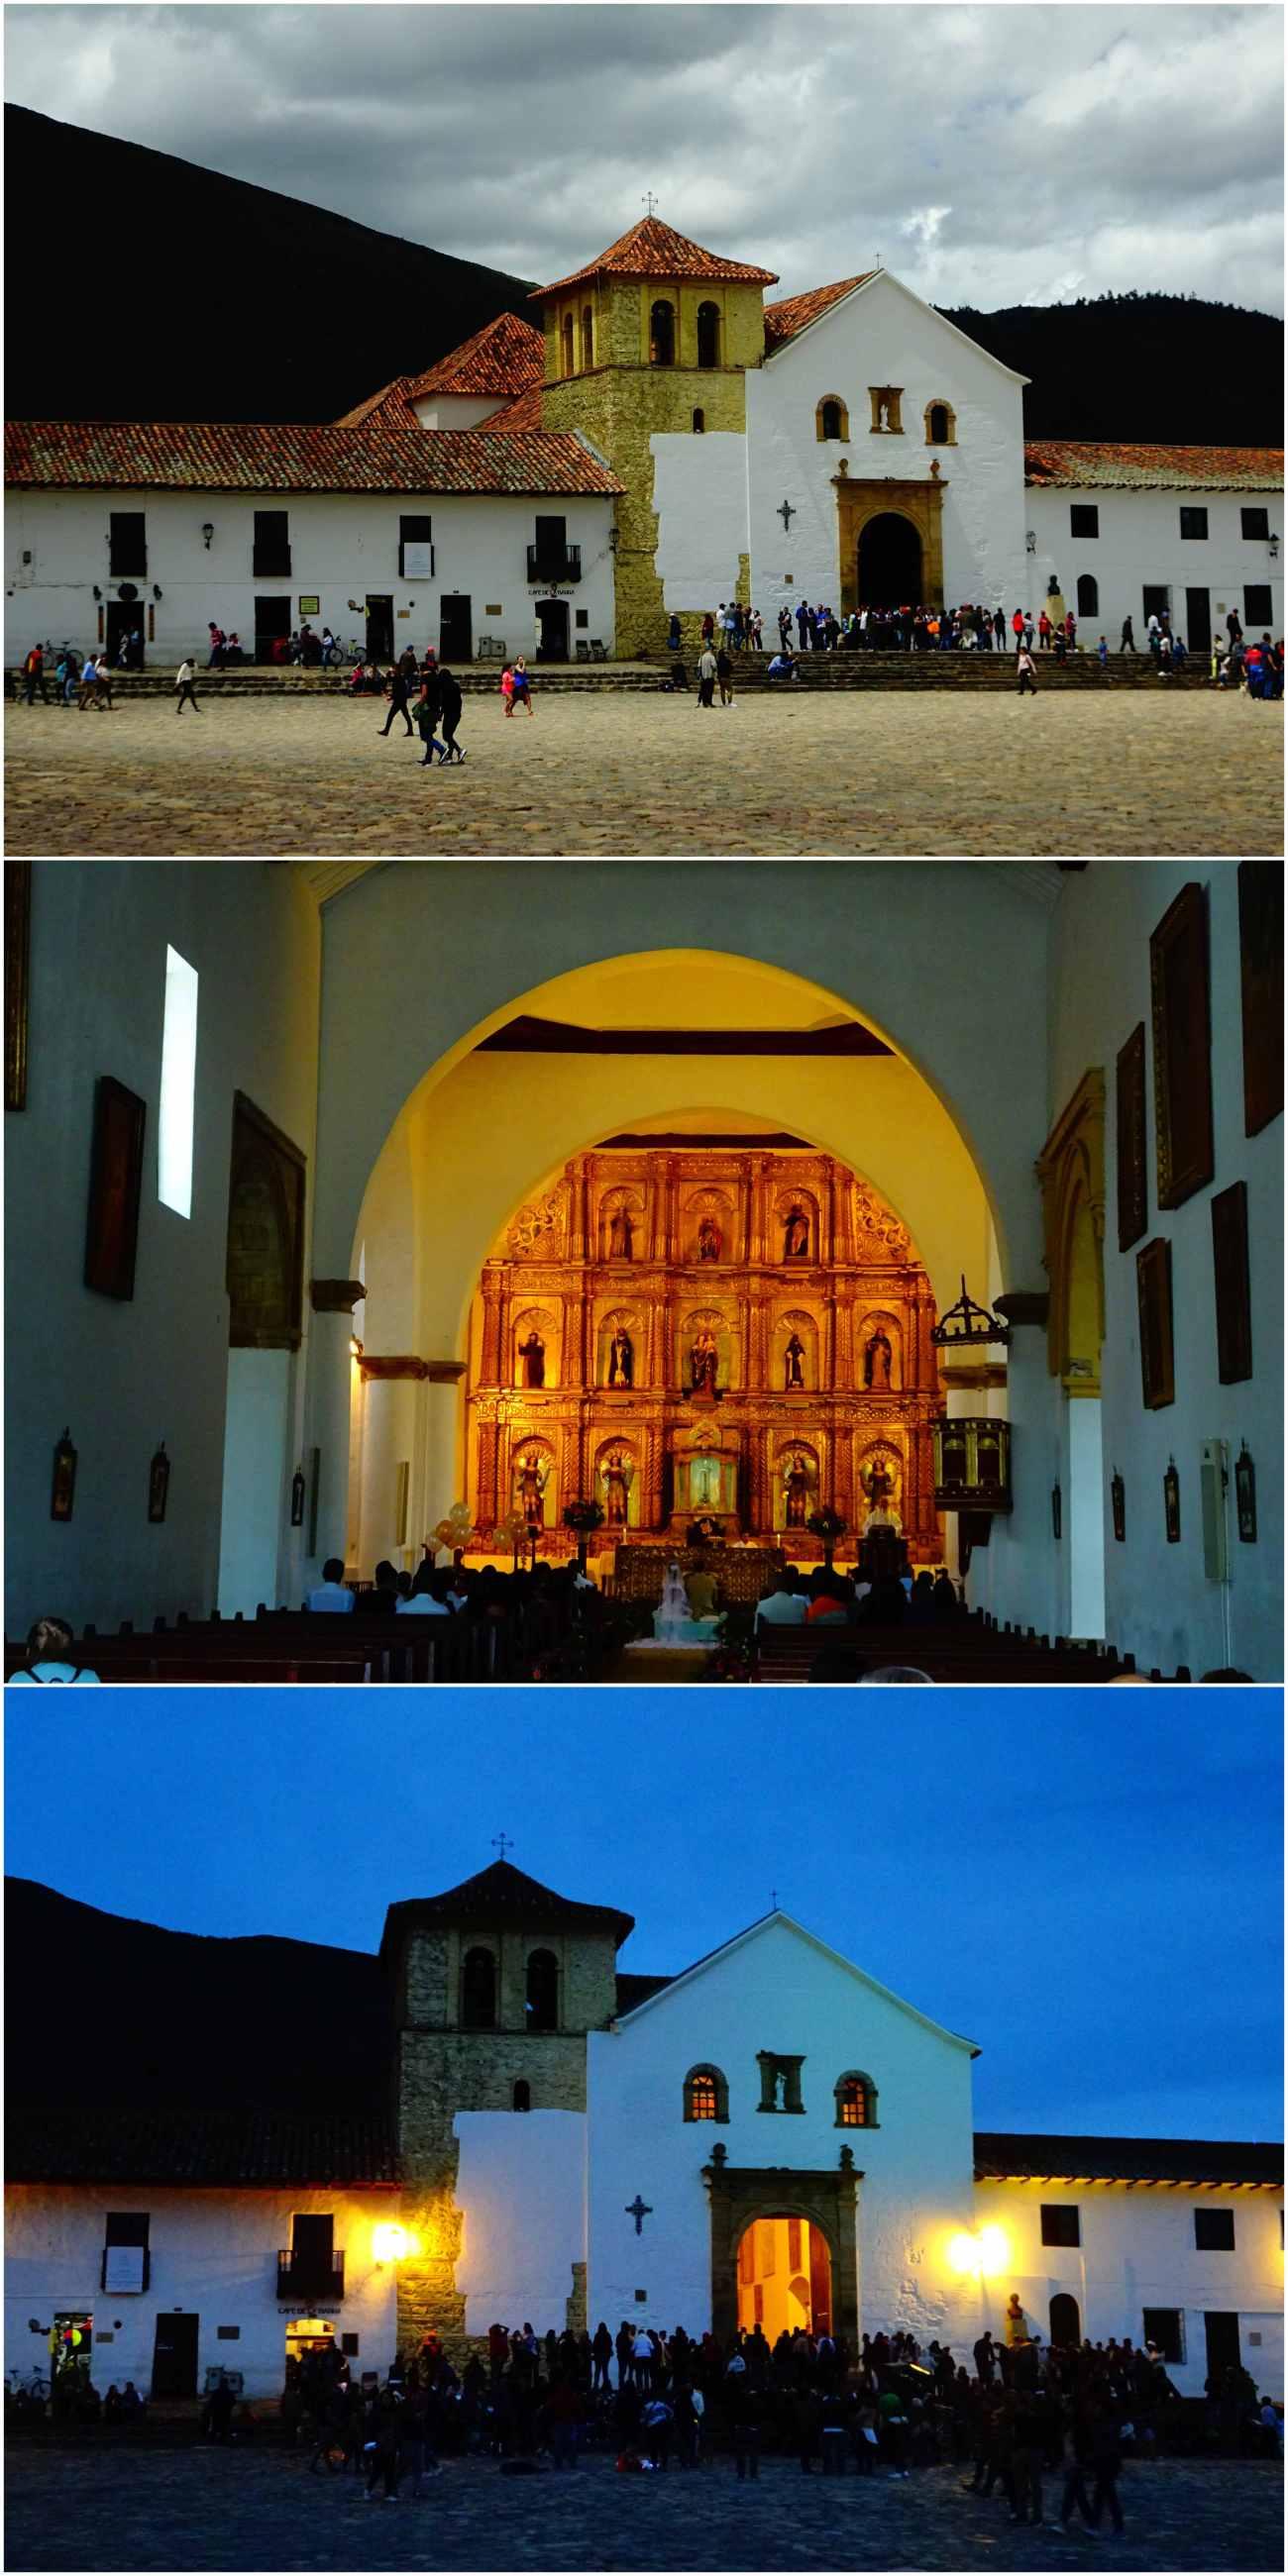 Eglise villa de leyva